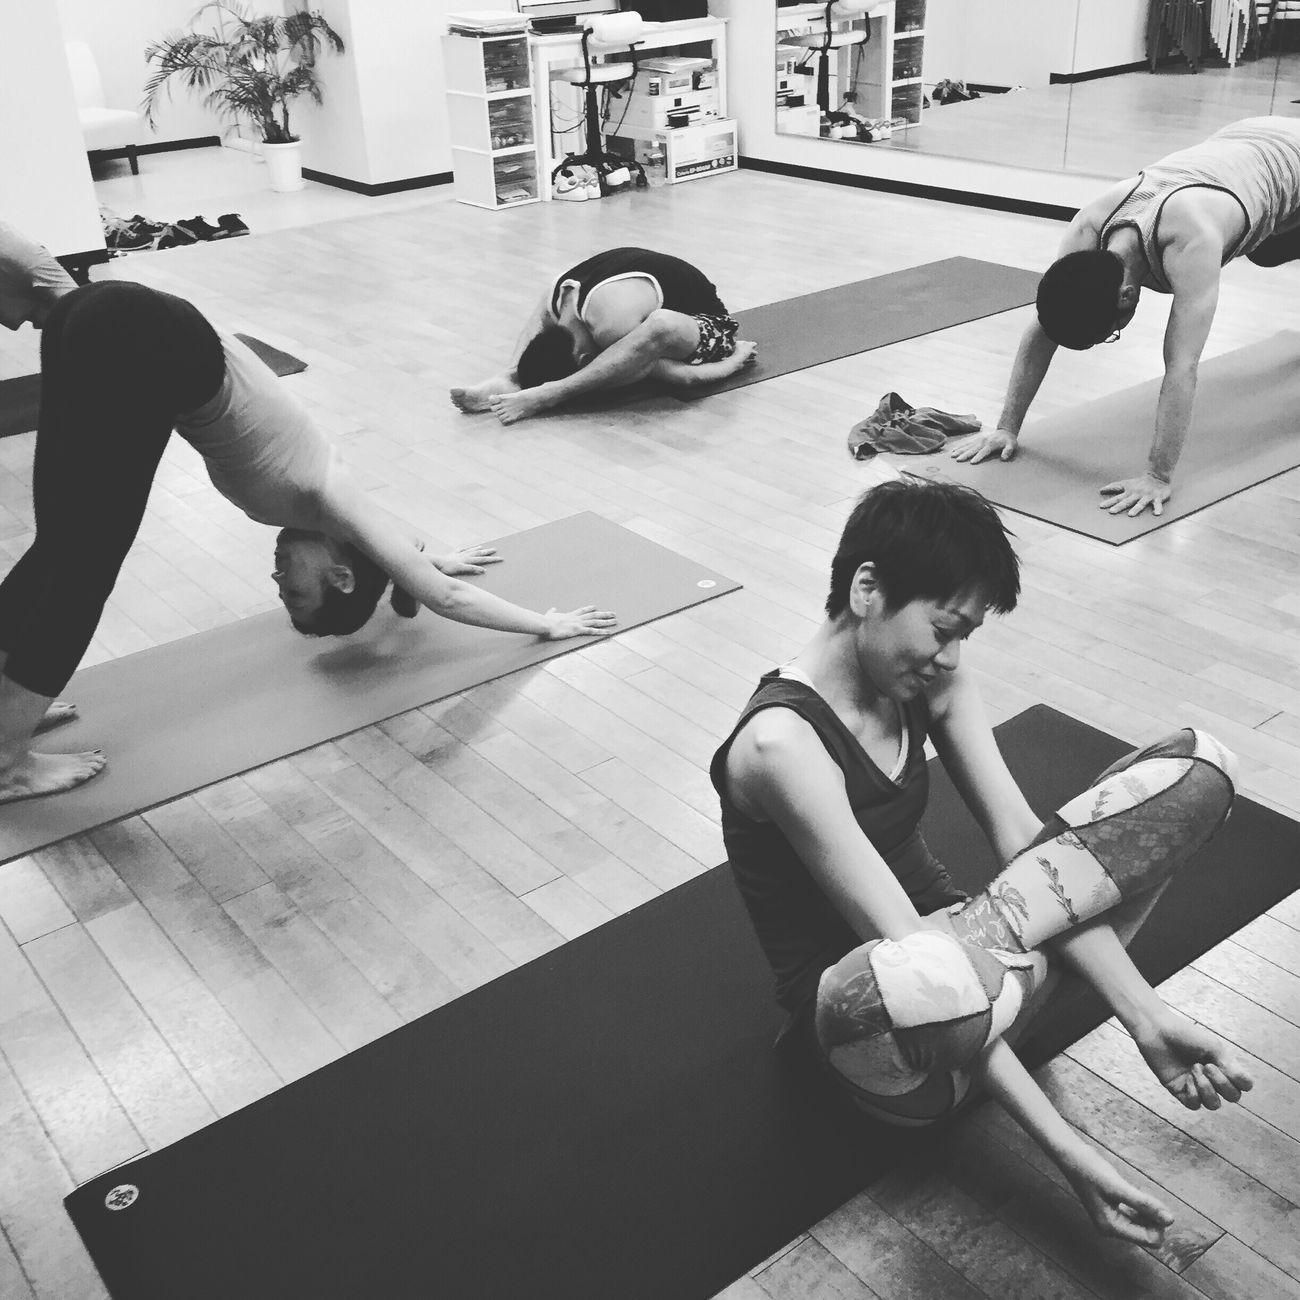 Yoga space Siddhi@テレビ派 来週の24日(木)午後5時頃から健康コーナーでオンエアしていただきます♬ Yoga Space Siddhi Ashtangayoga Mysore Class Yoga ヨガ 広島